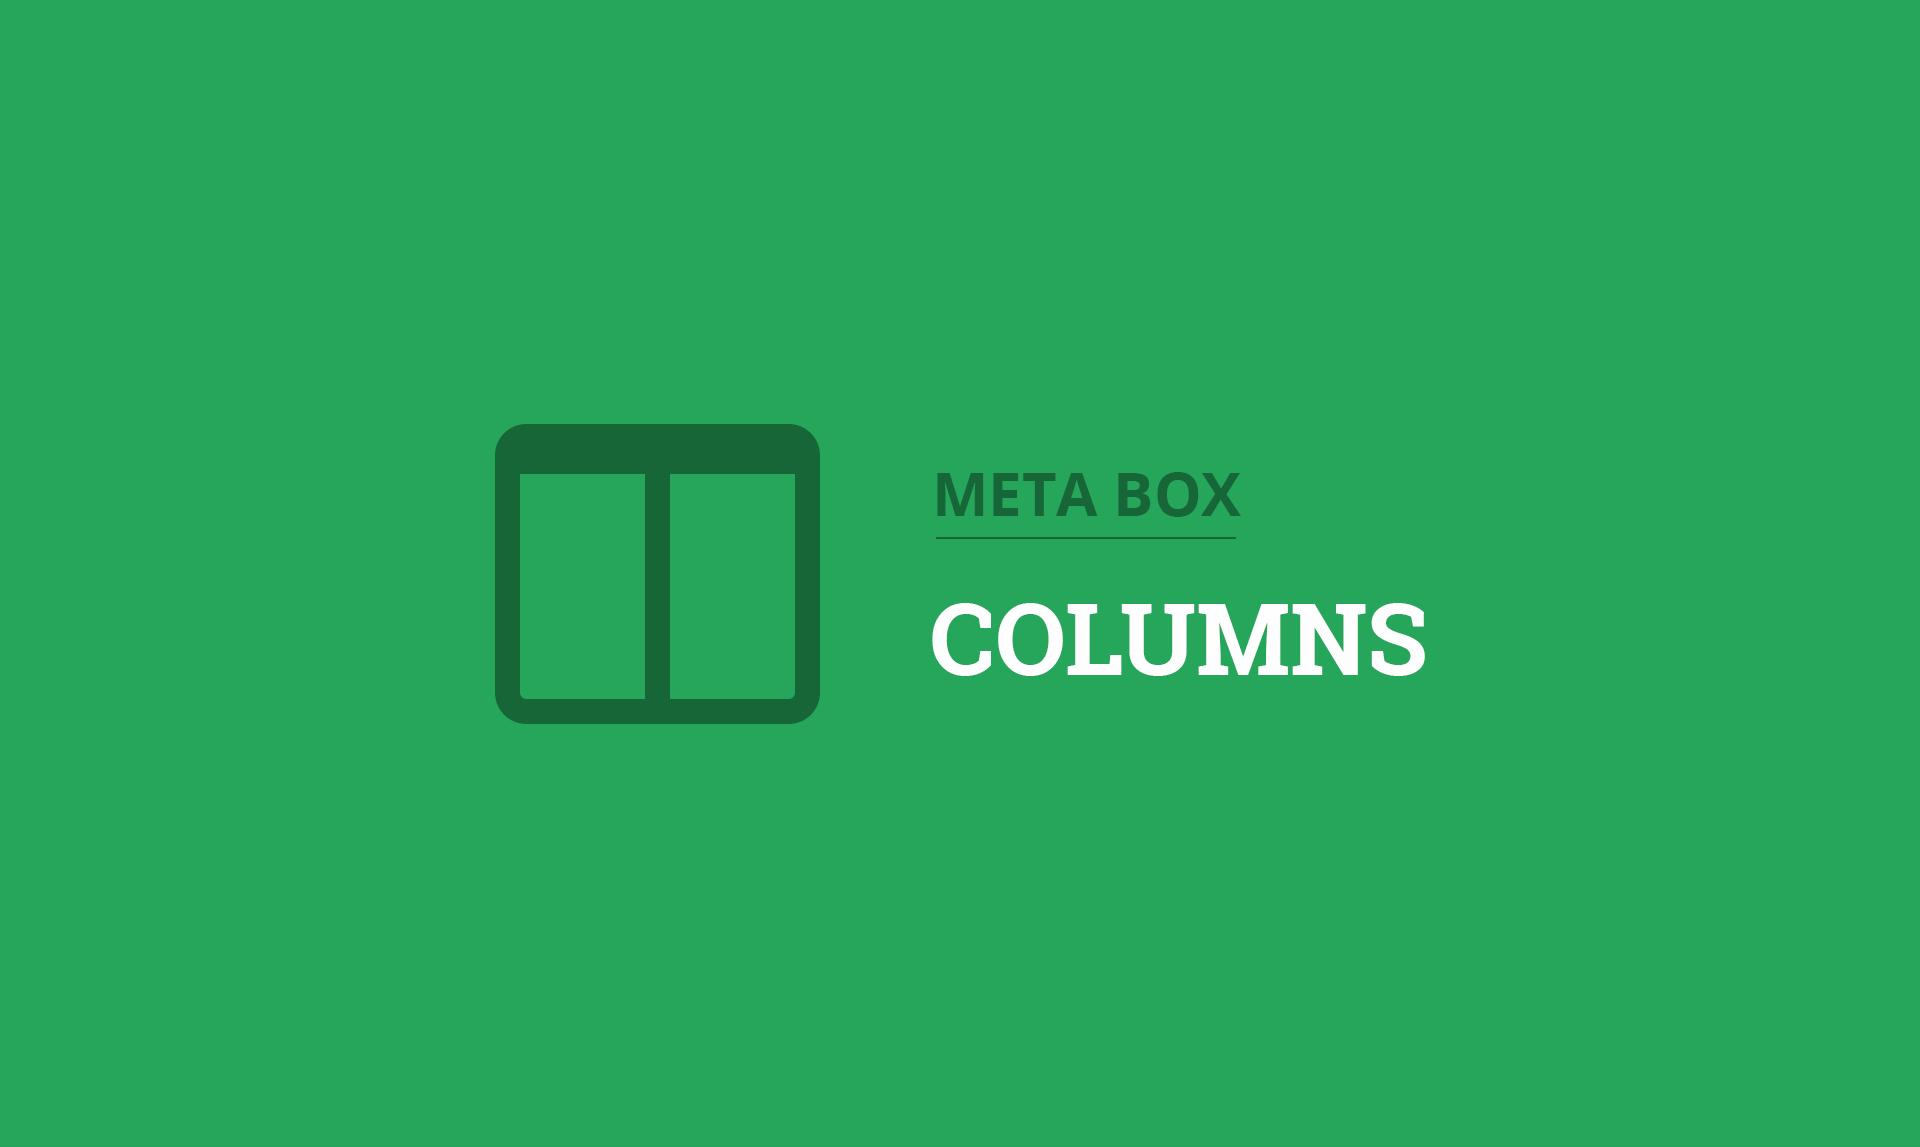 Meta Box Columns